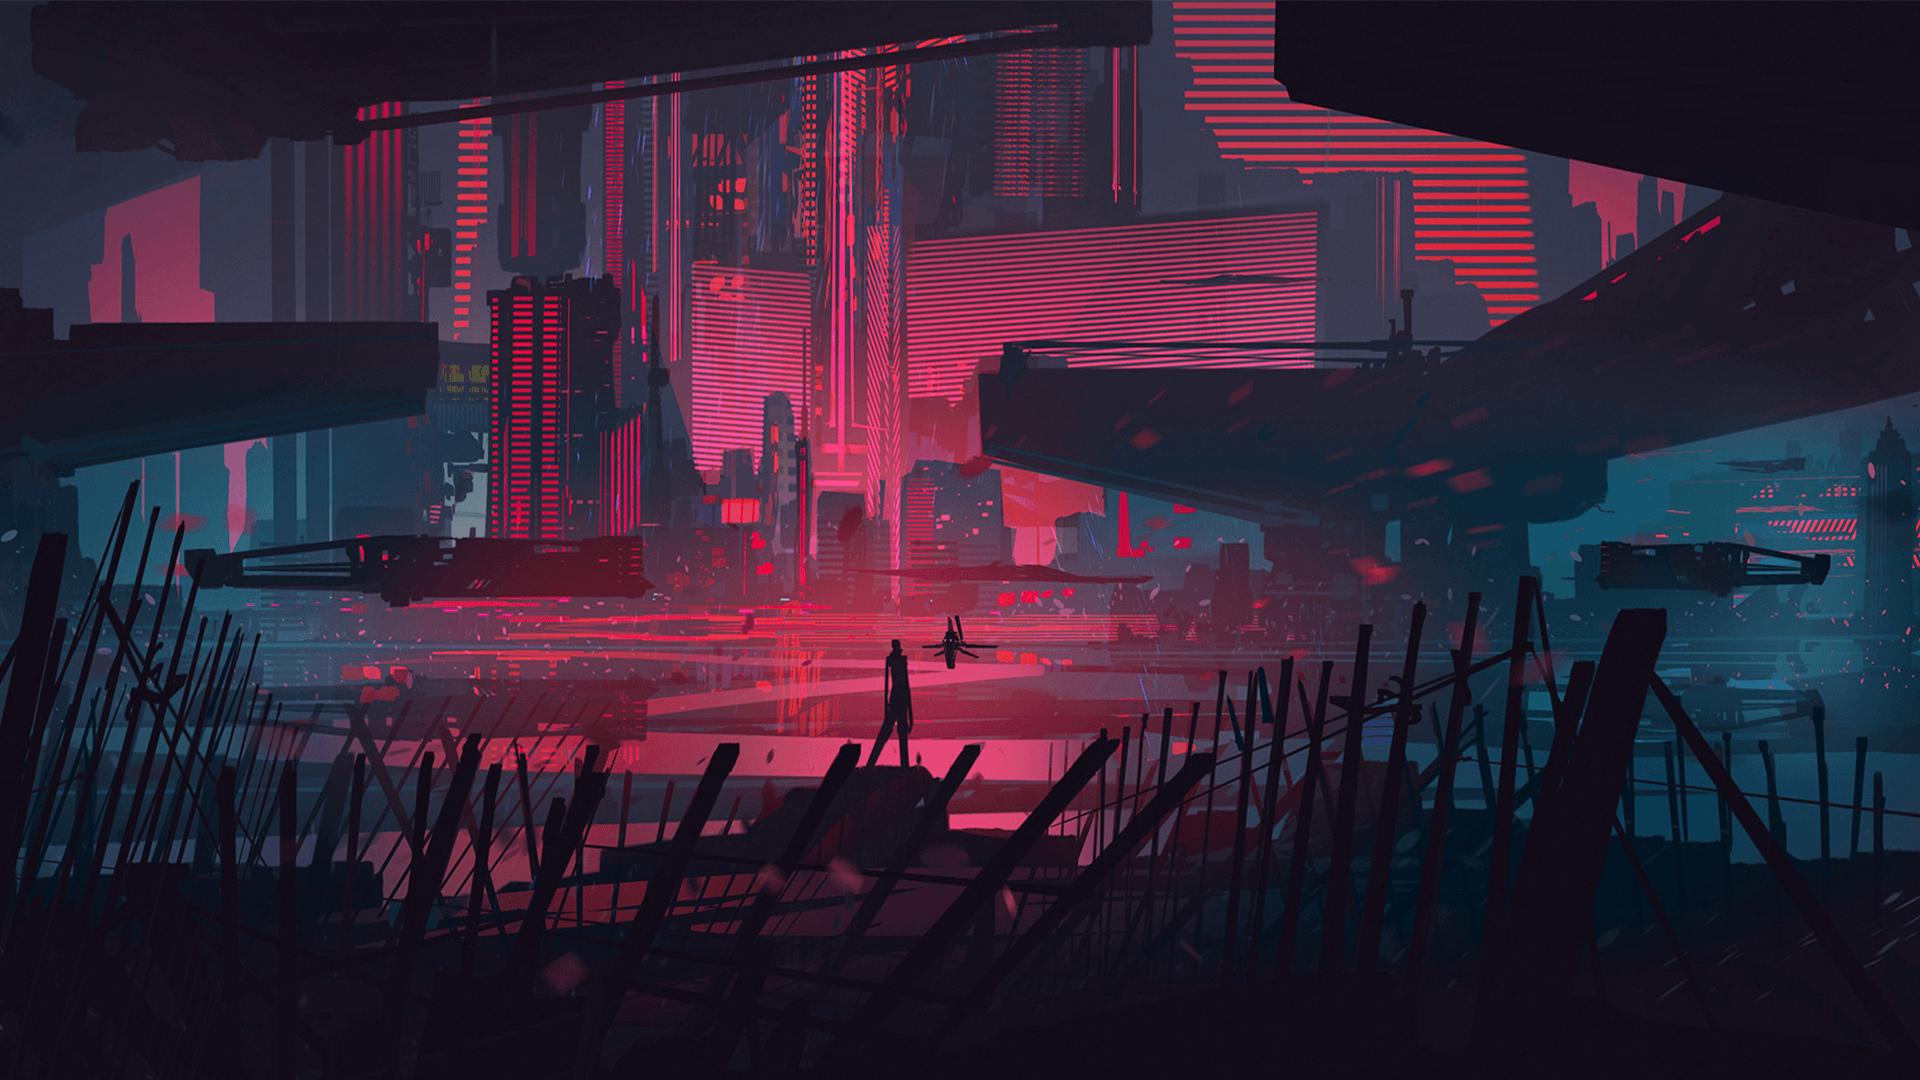 Amazing Cyberpunk Neon City Wallpaper 4K Pics